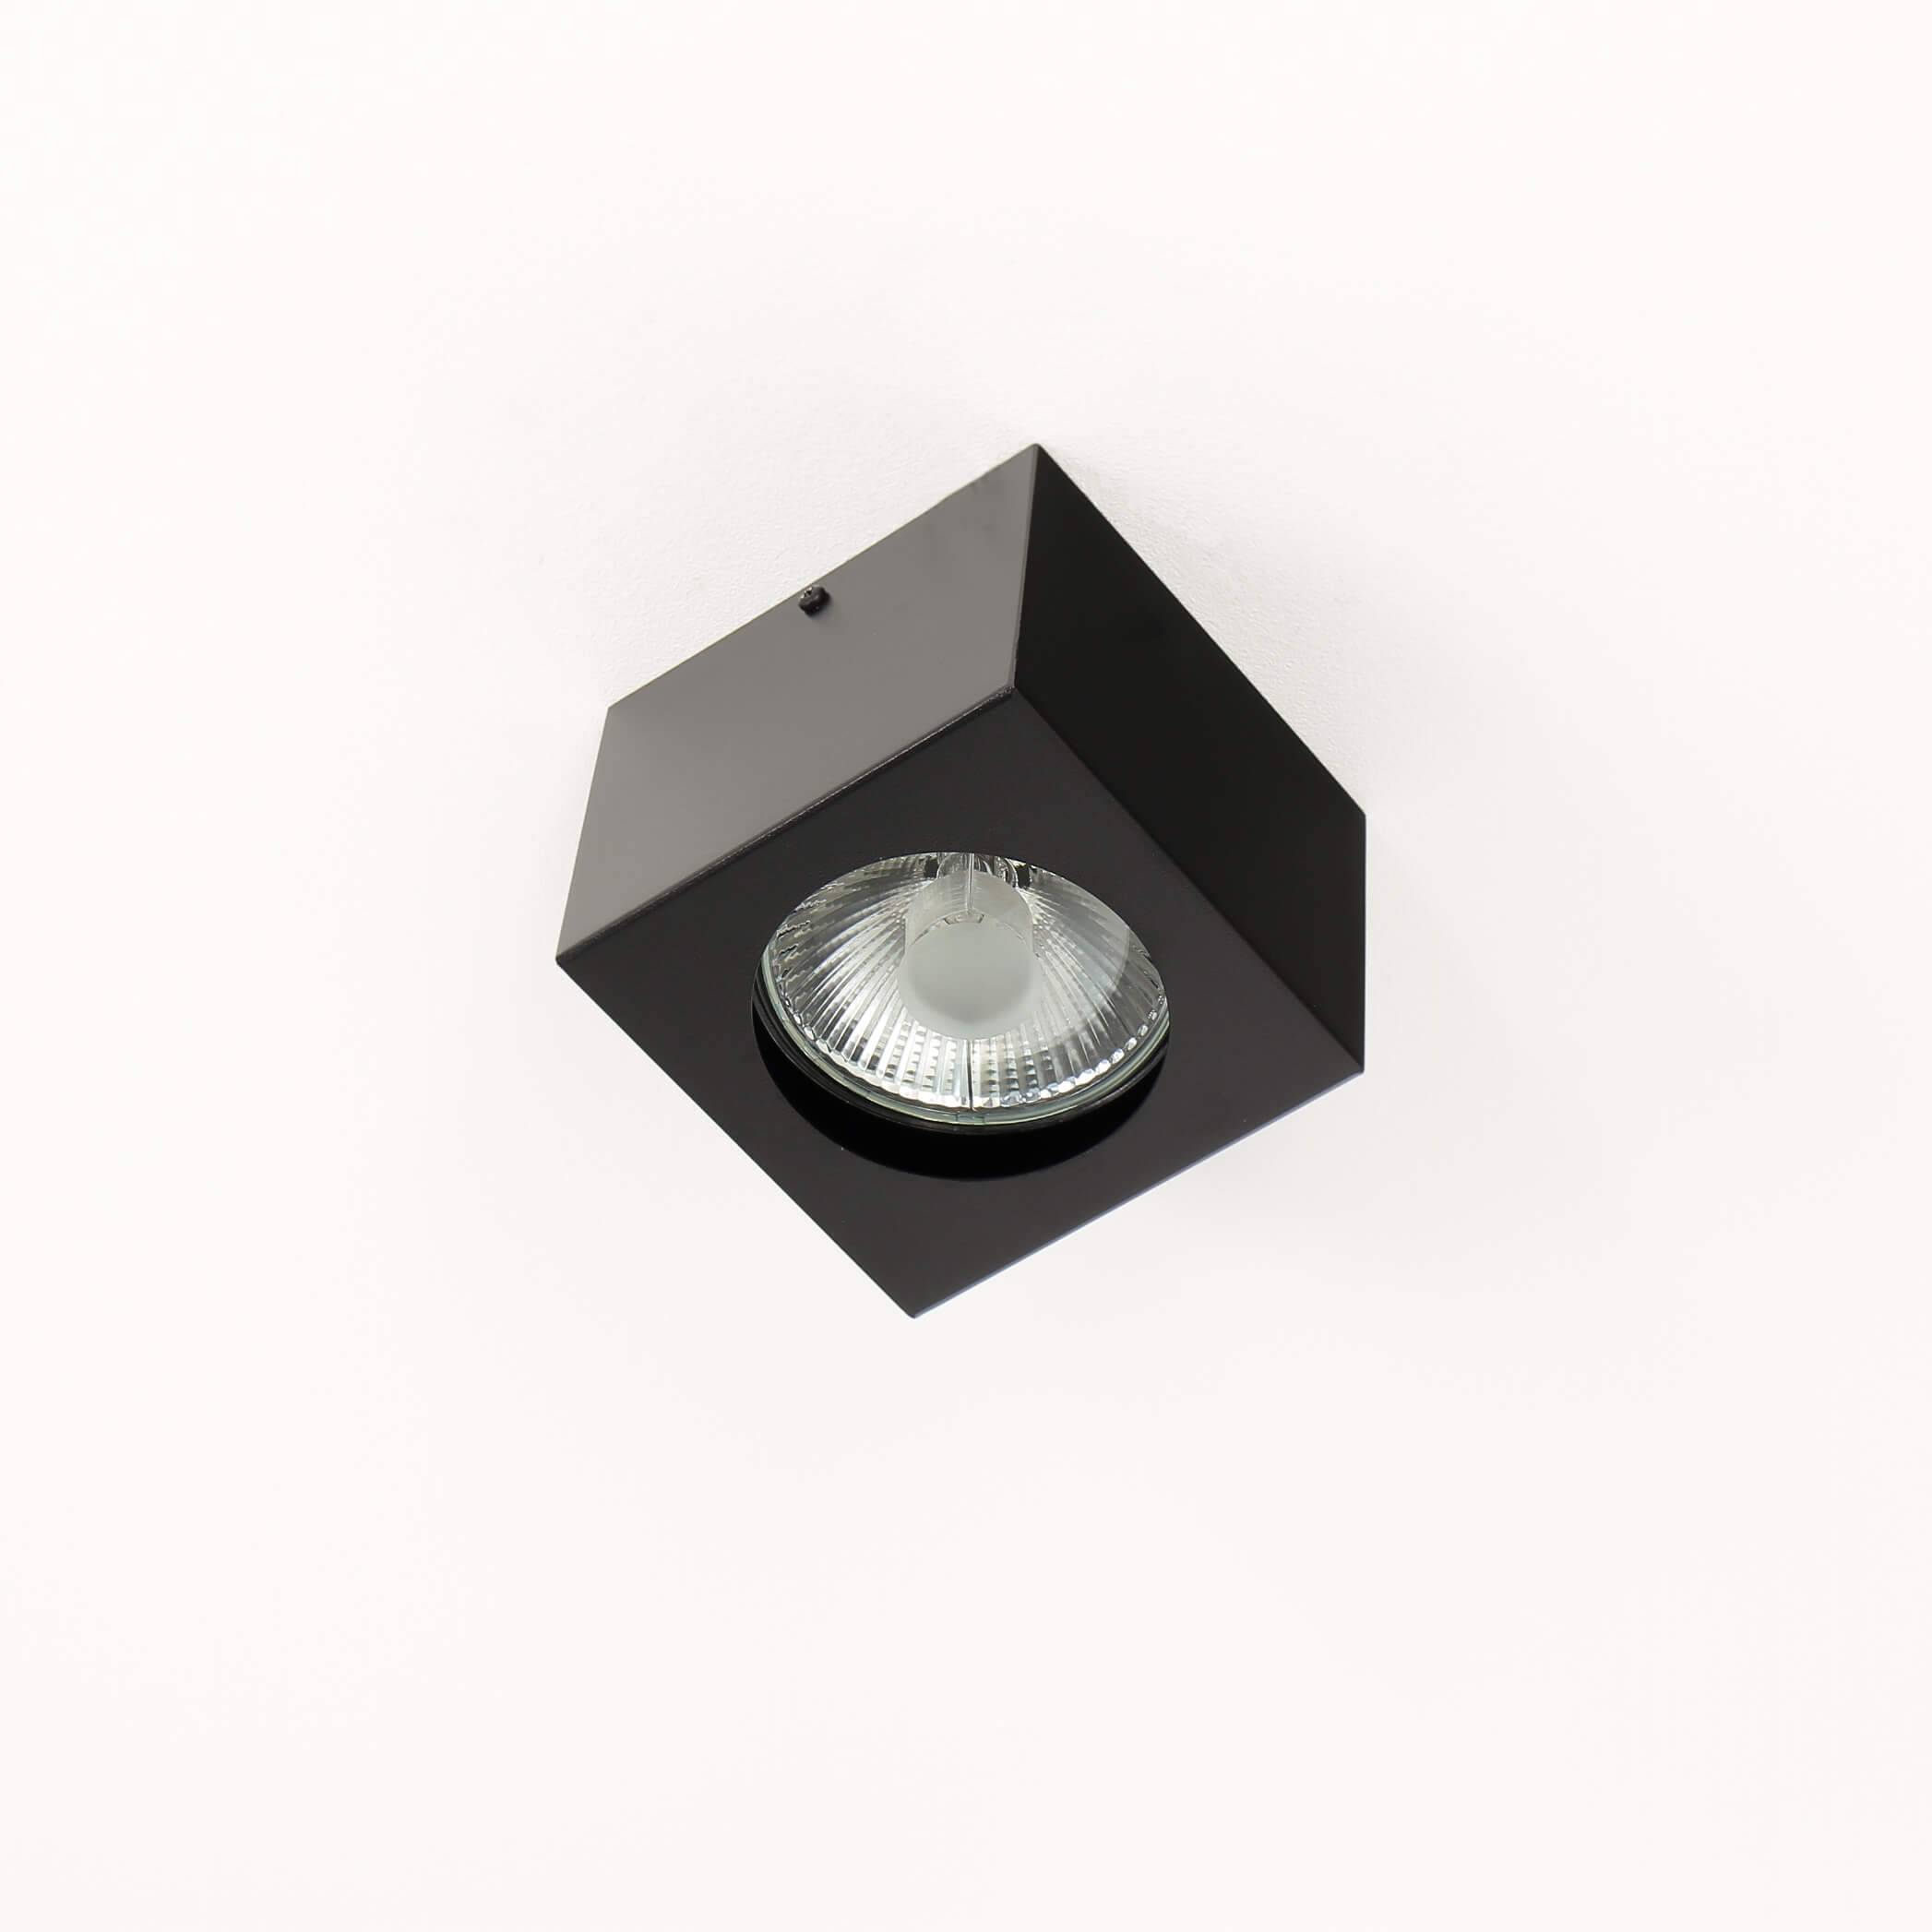 Spot Lampe Schwarz Decke quadratisch GU10